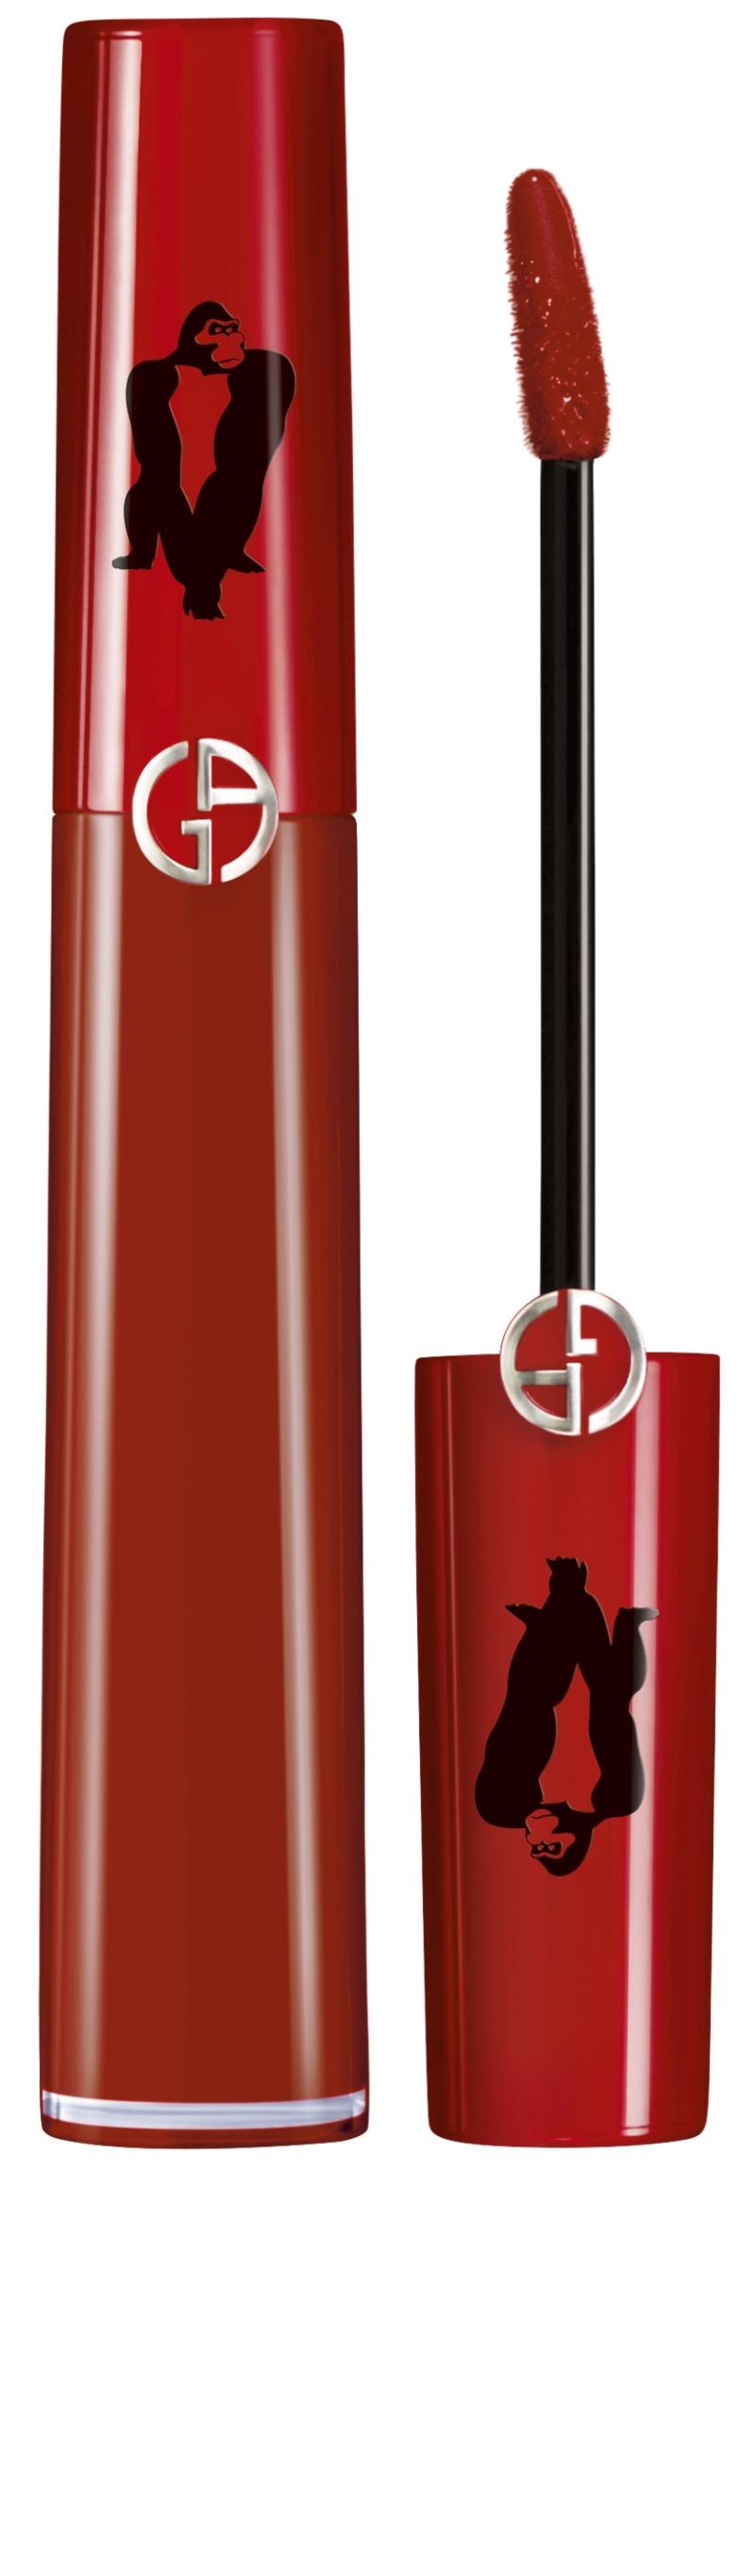 Giorgio Armani奢華絲絨訂製唇萃(#405 URI限量版)6.5ml,NT1,200